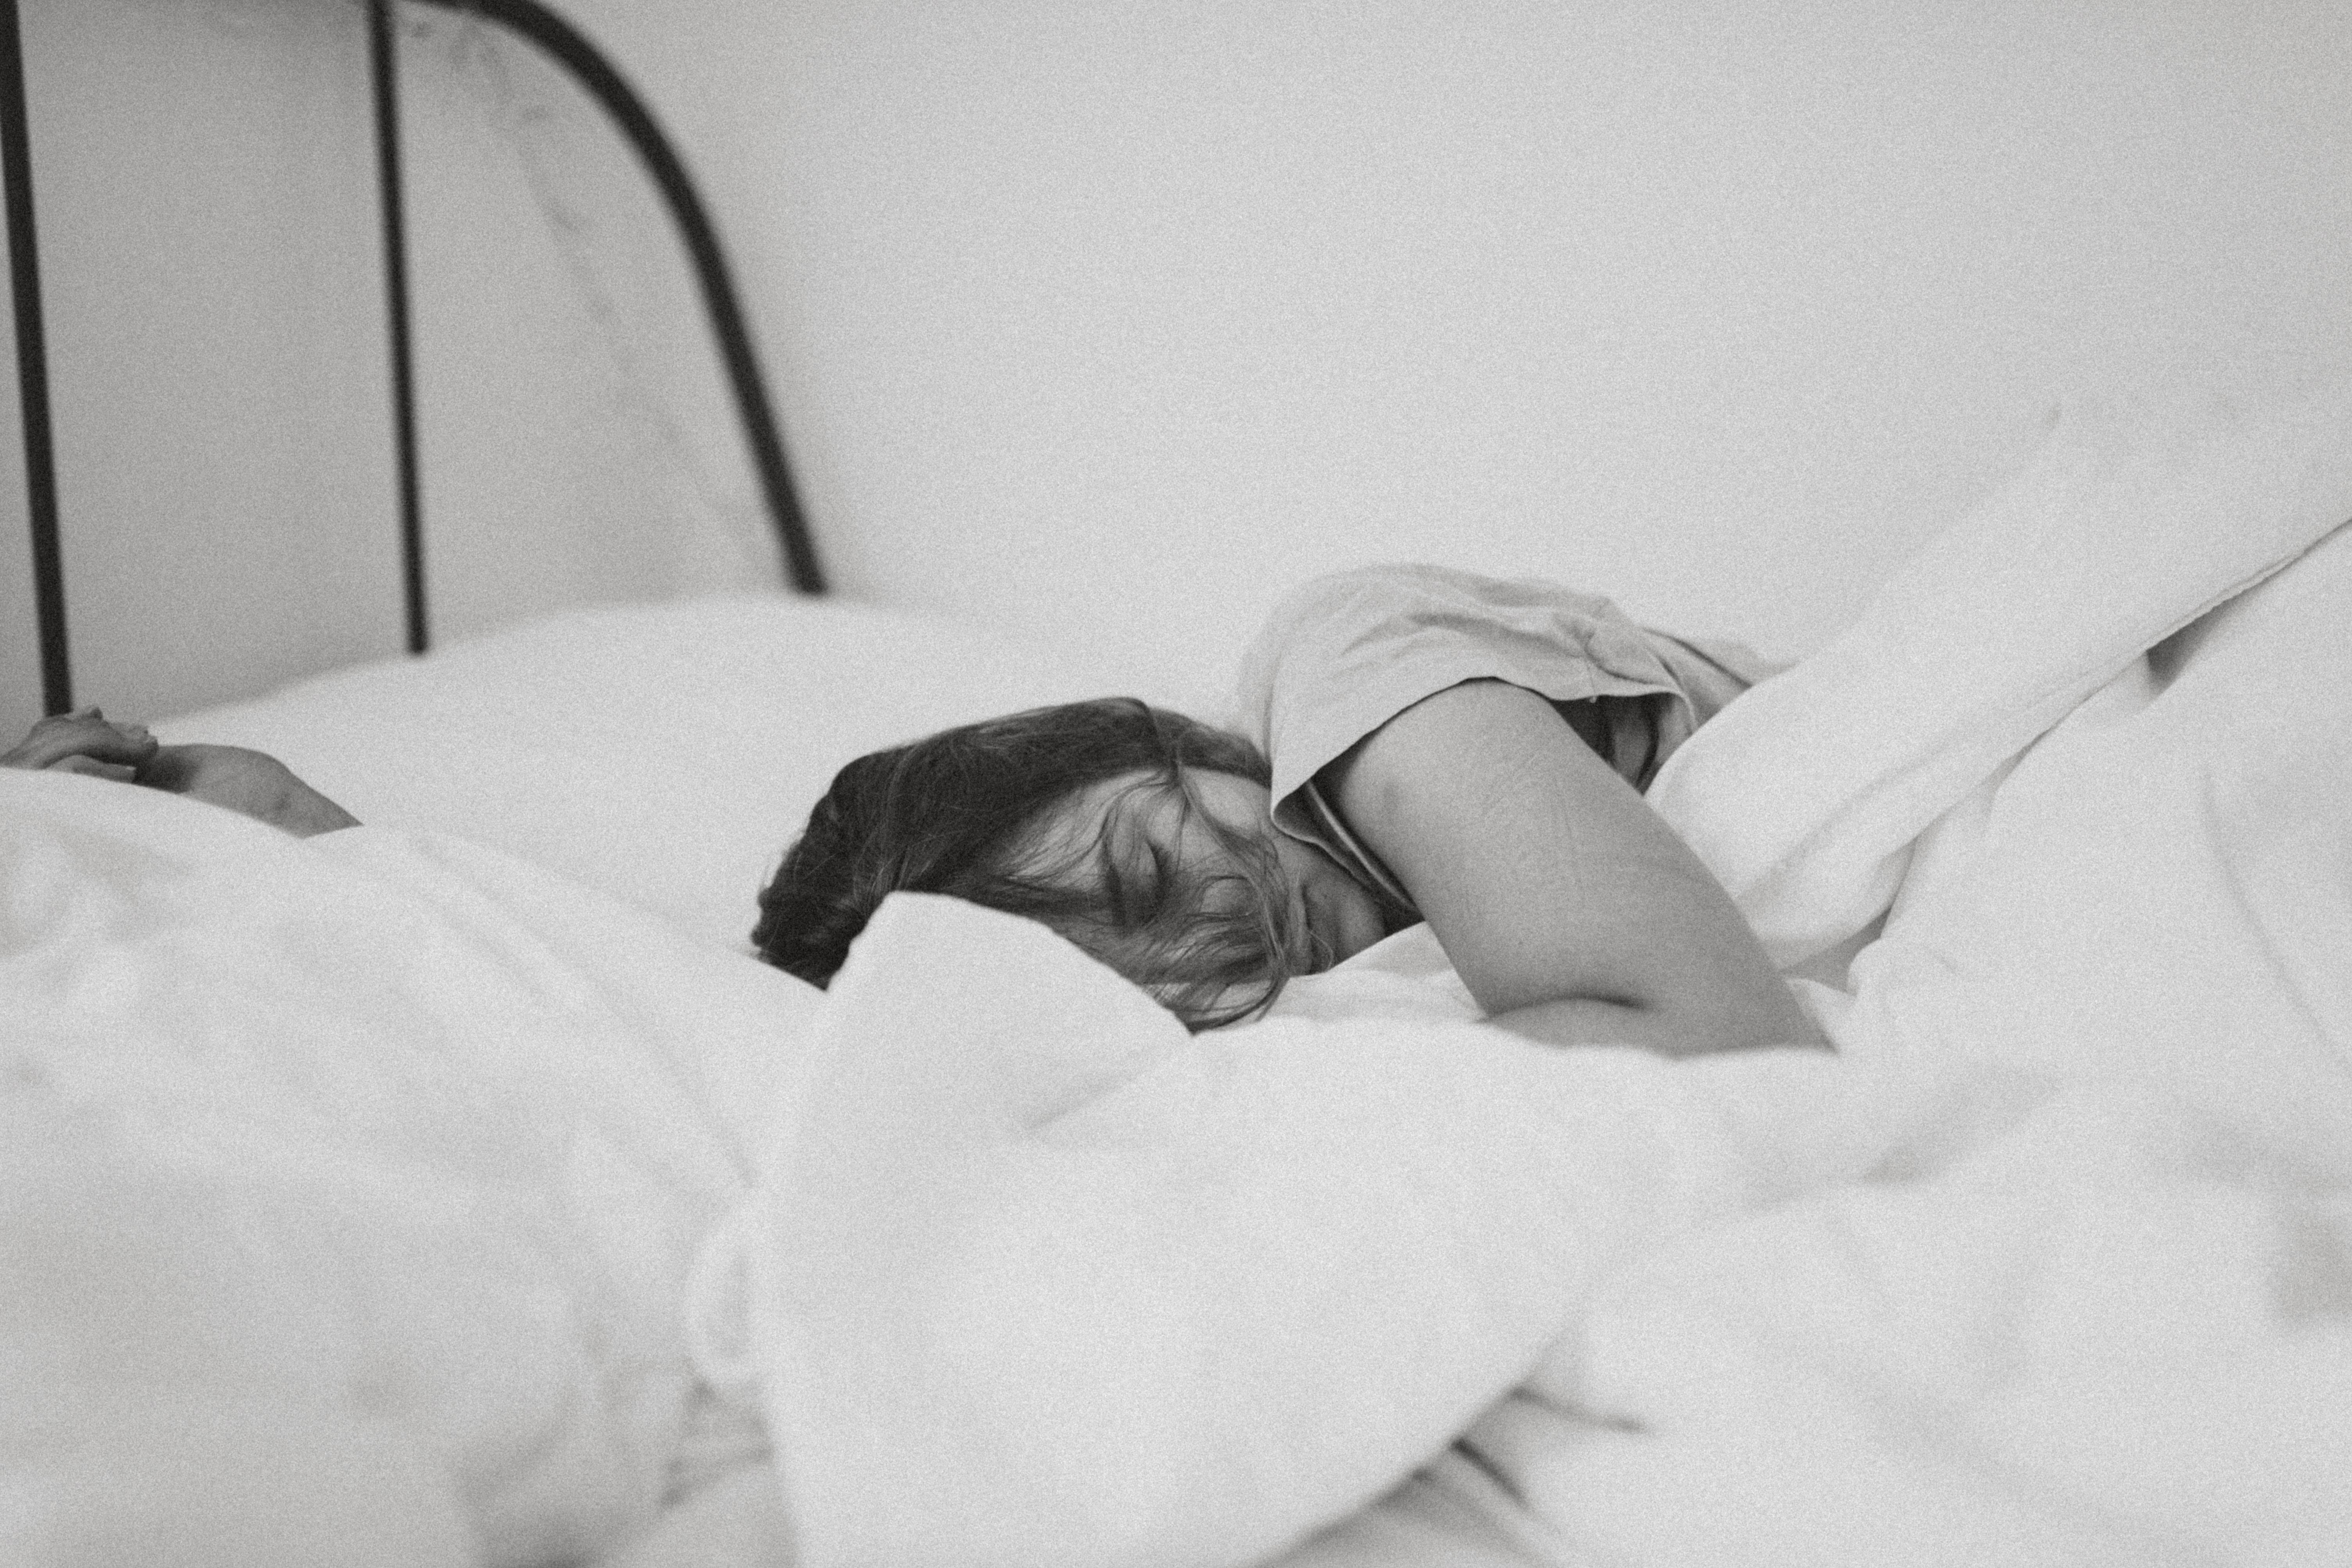 ypes of Anxiety Dreams